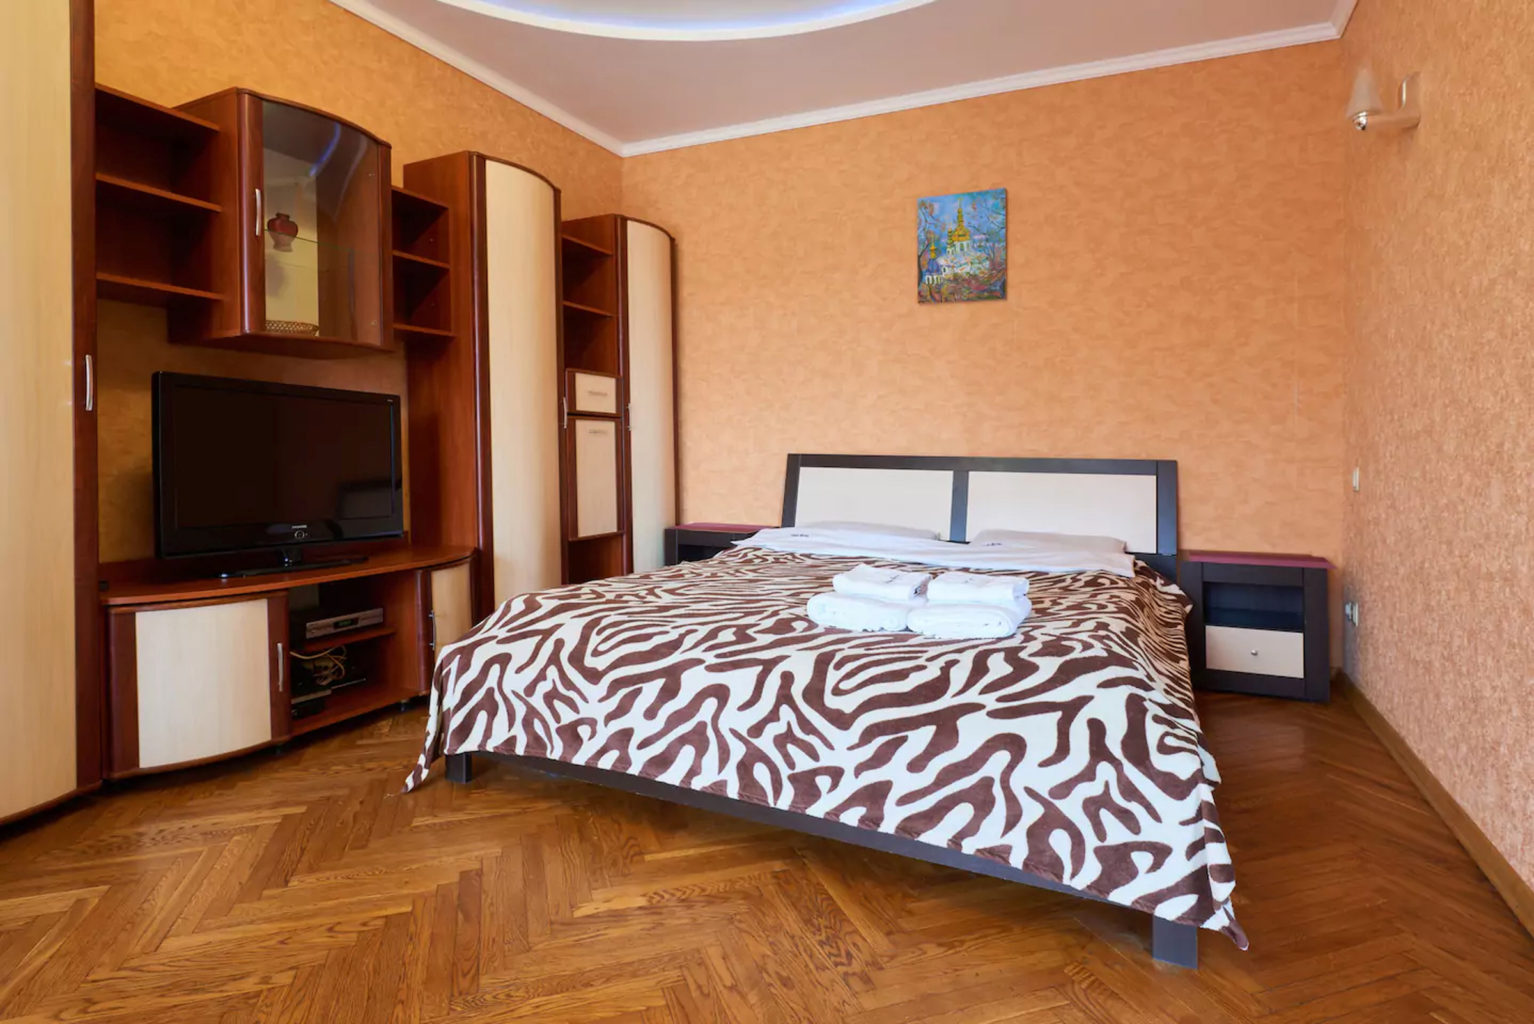 Apartment for shore Rent in Kiev, malaya gitomirskaya 10